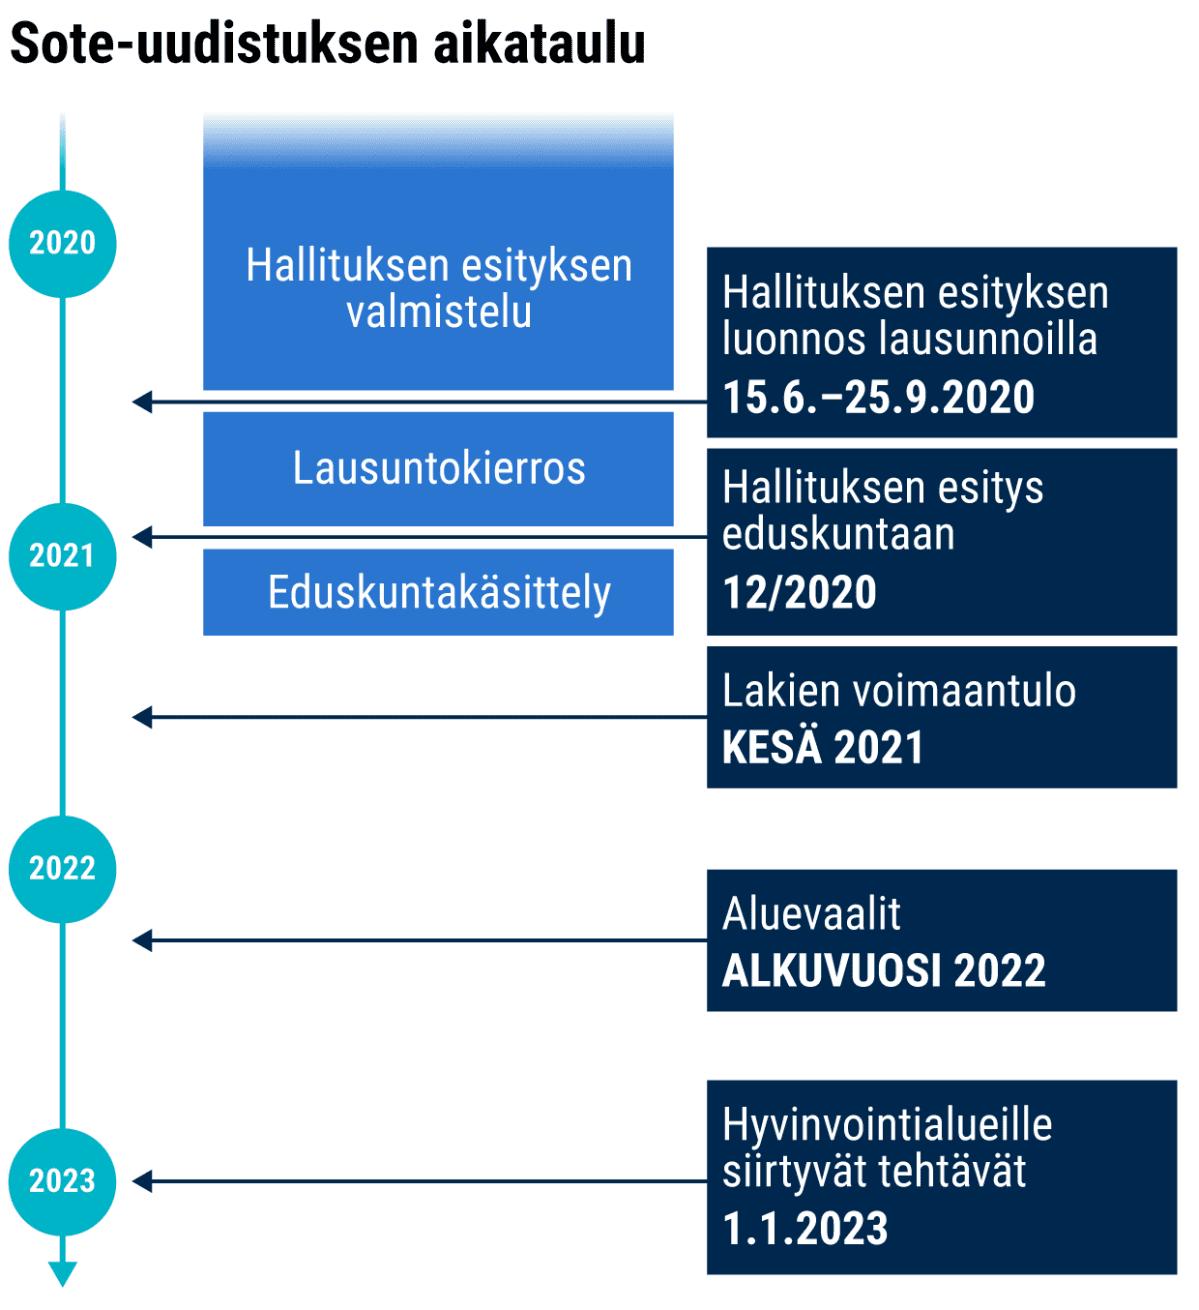 Sote-uudistuksen aikataulu 2020–2022